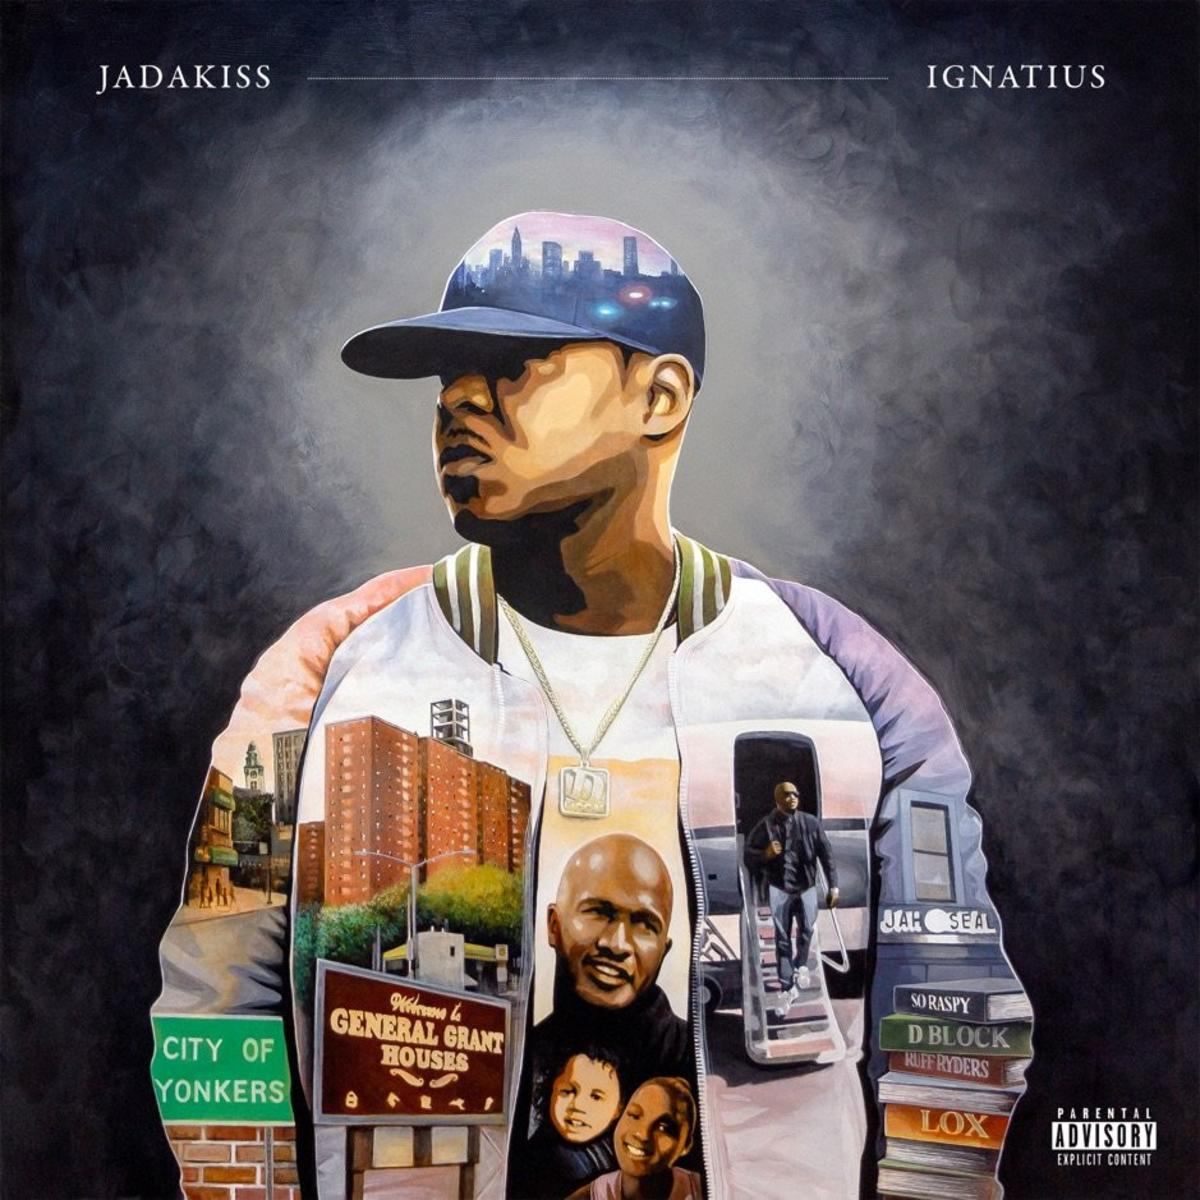 Jadakiss Feat. 2 Chainz - Angels Getting Pedicured